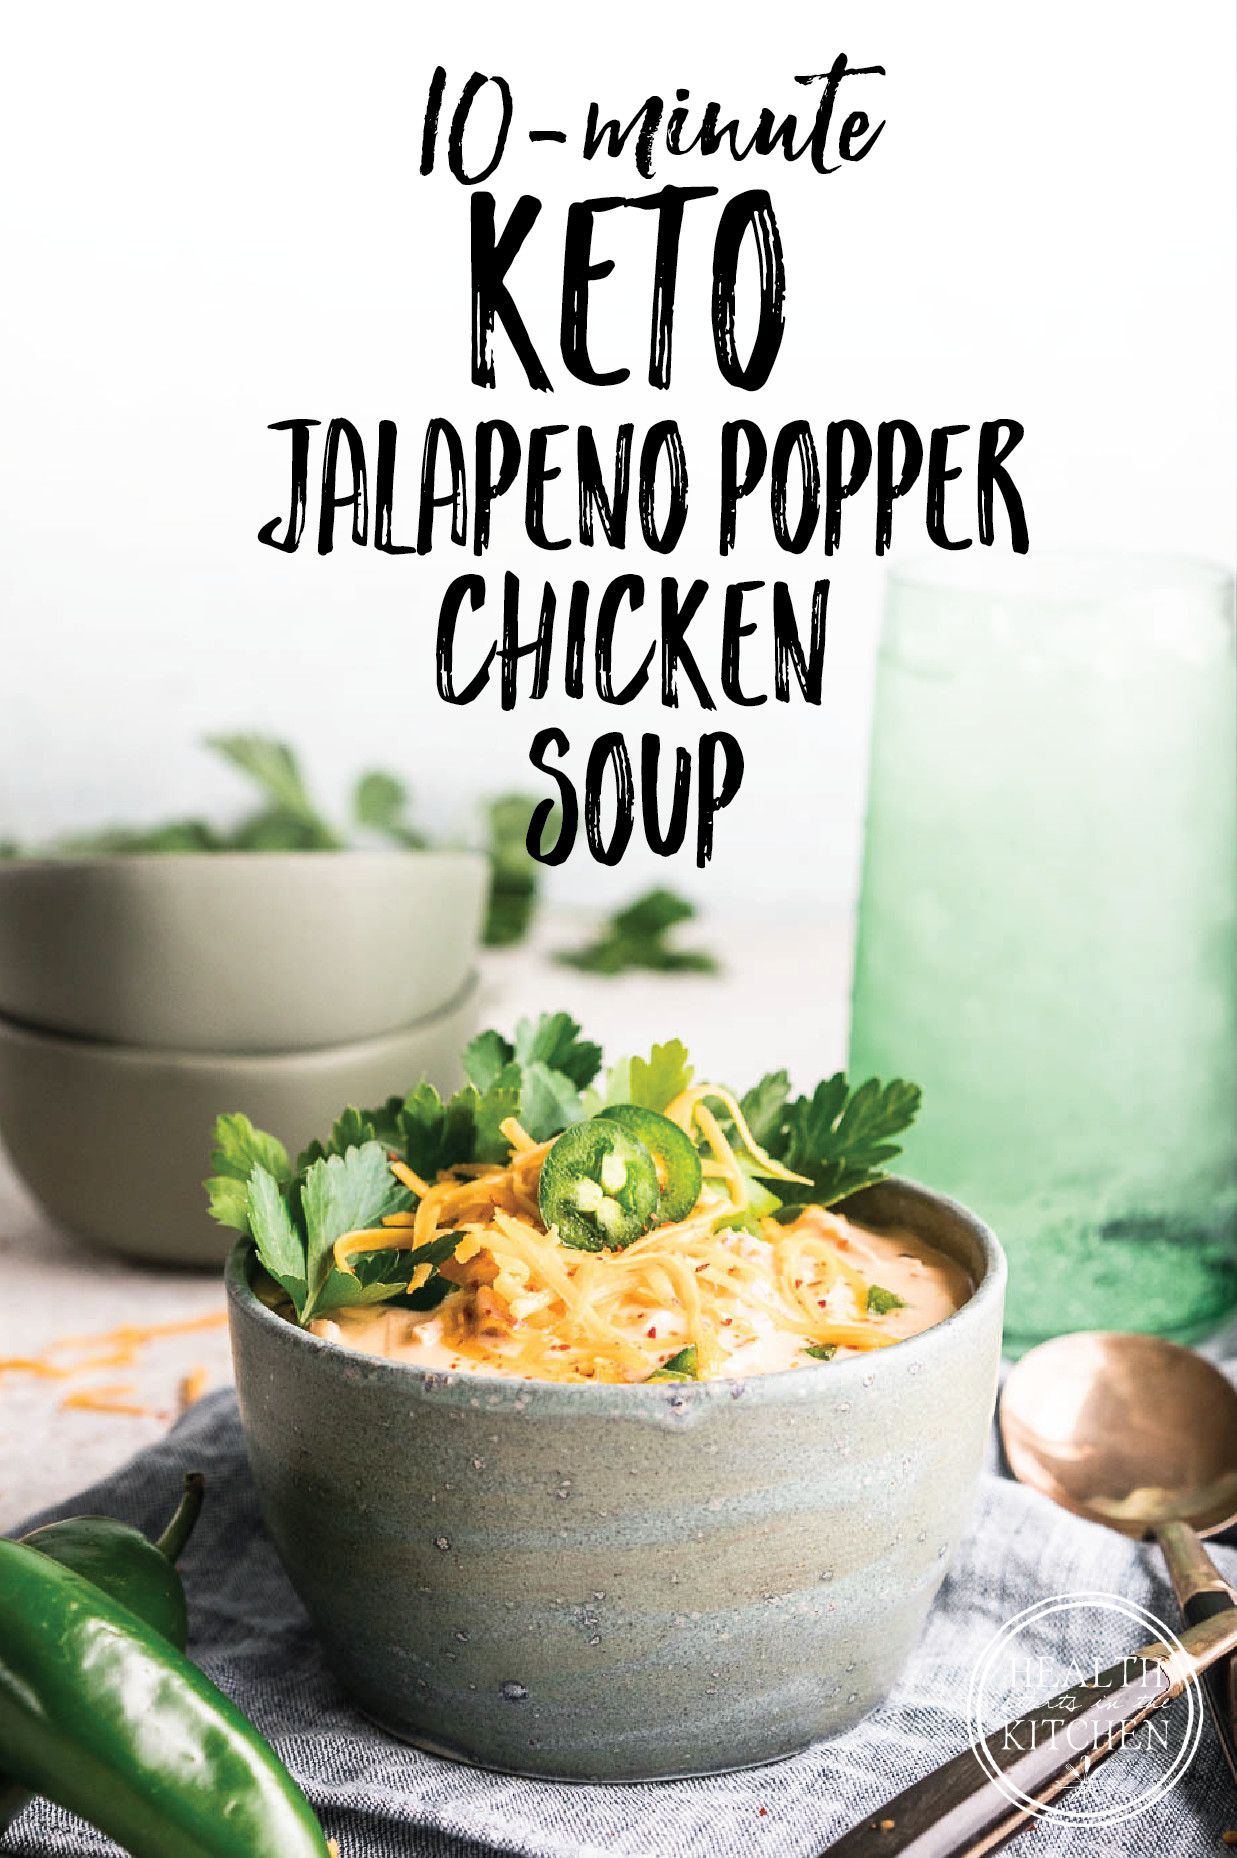 Photo of 10 Minute Easy Keto Jalapeño Popper Chicken Soup